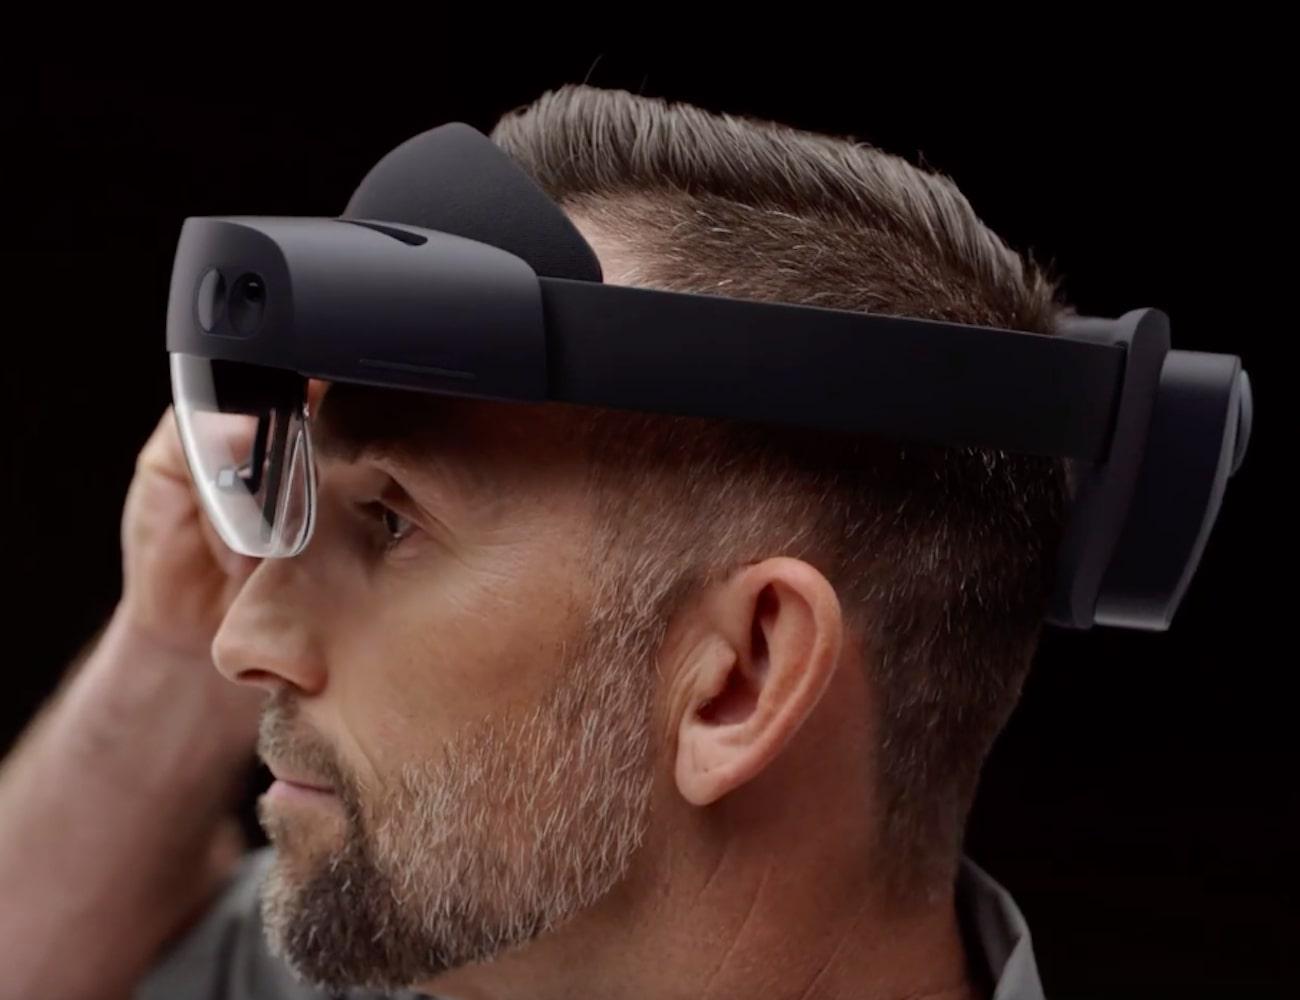 Microsoft HoloLens 2 Advanced Mixed Reality Headset